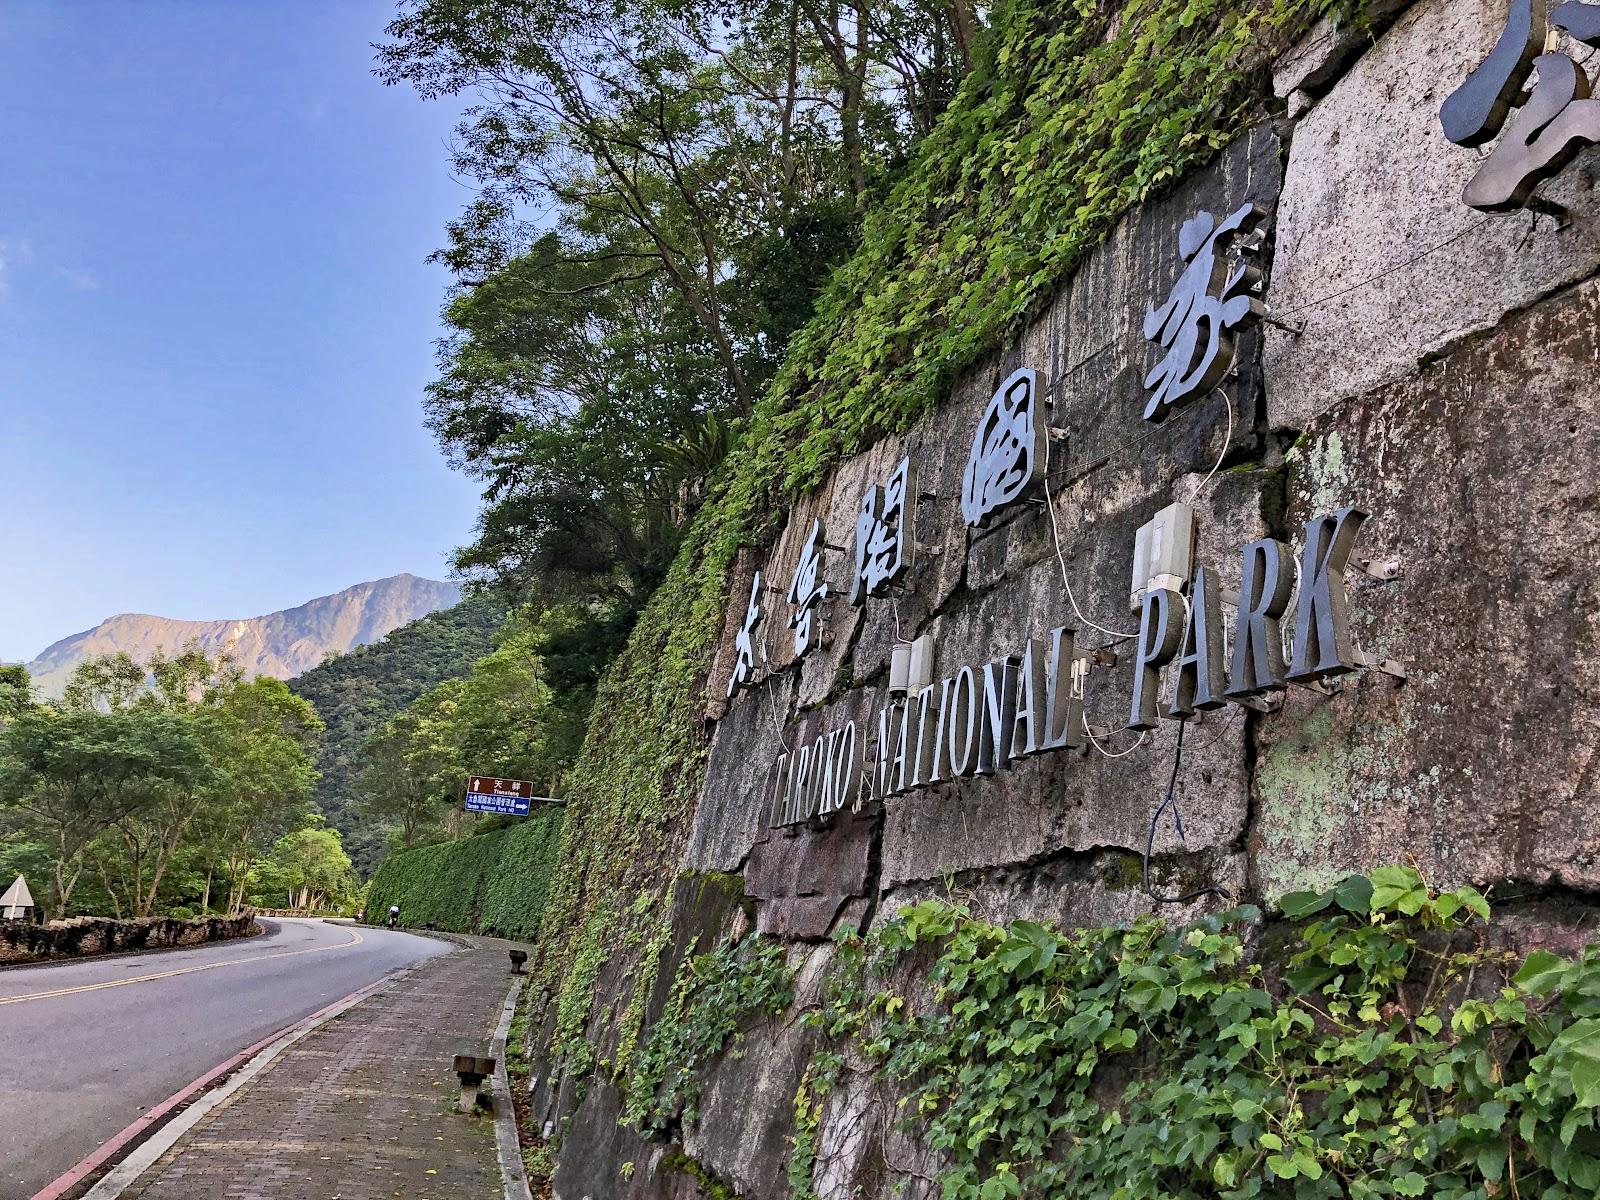 Bike climb Wuling Pass East - Taroko National Park sign, roadway